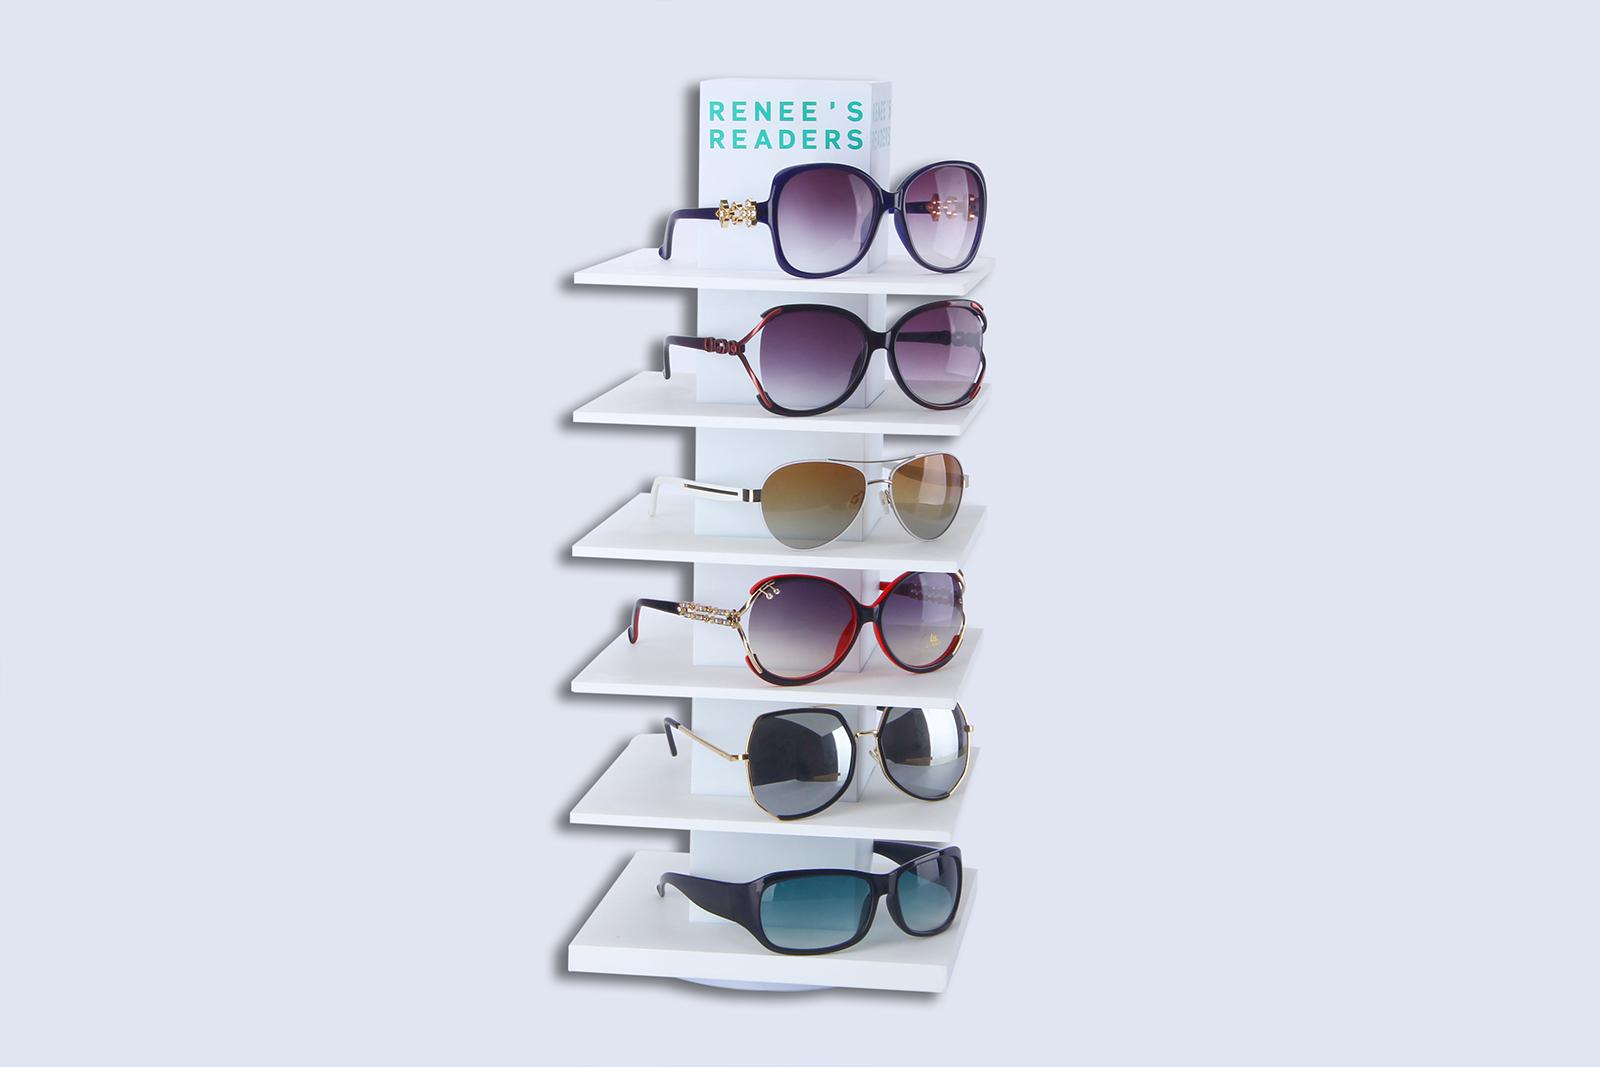 Glasses acrylic display stand